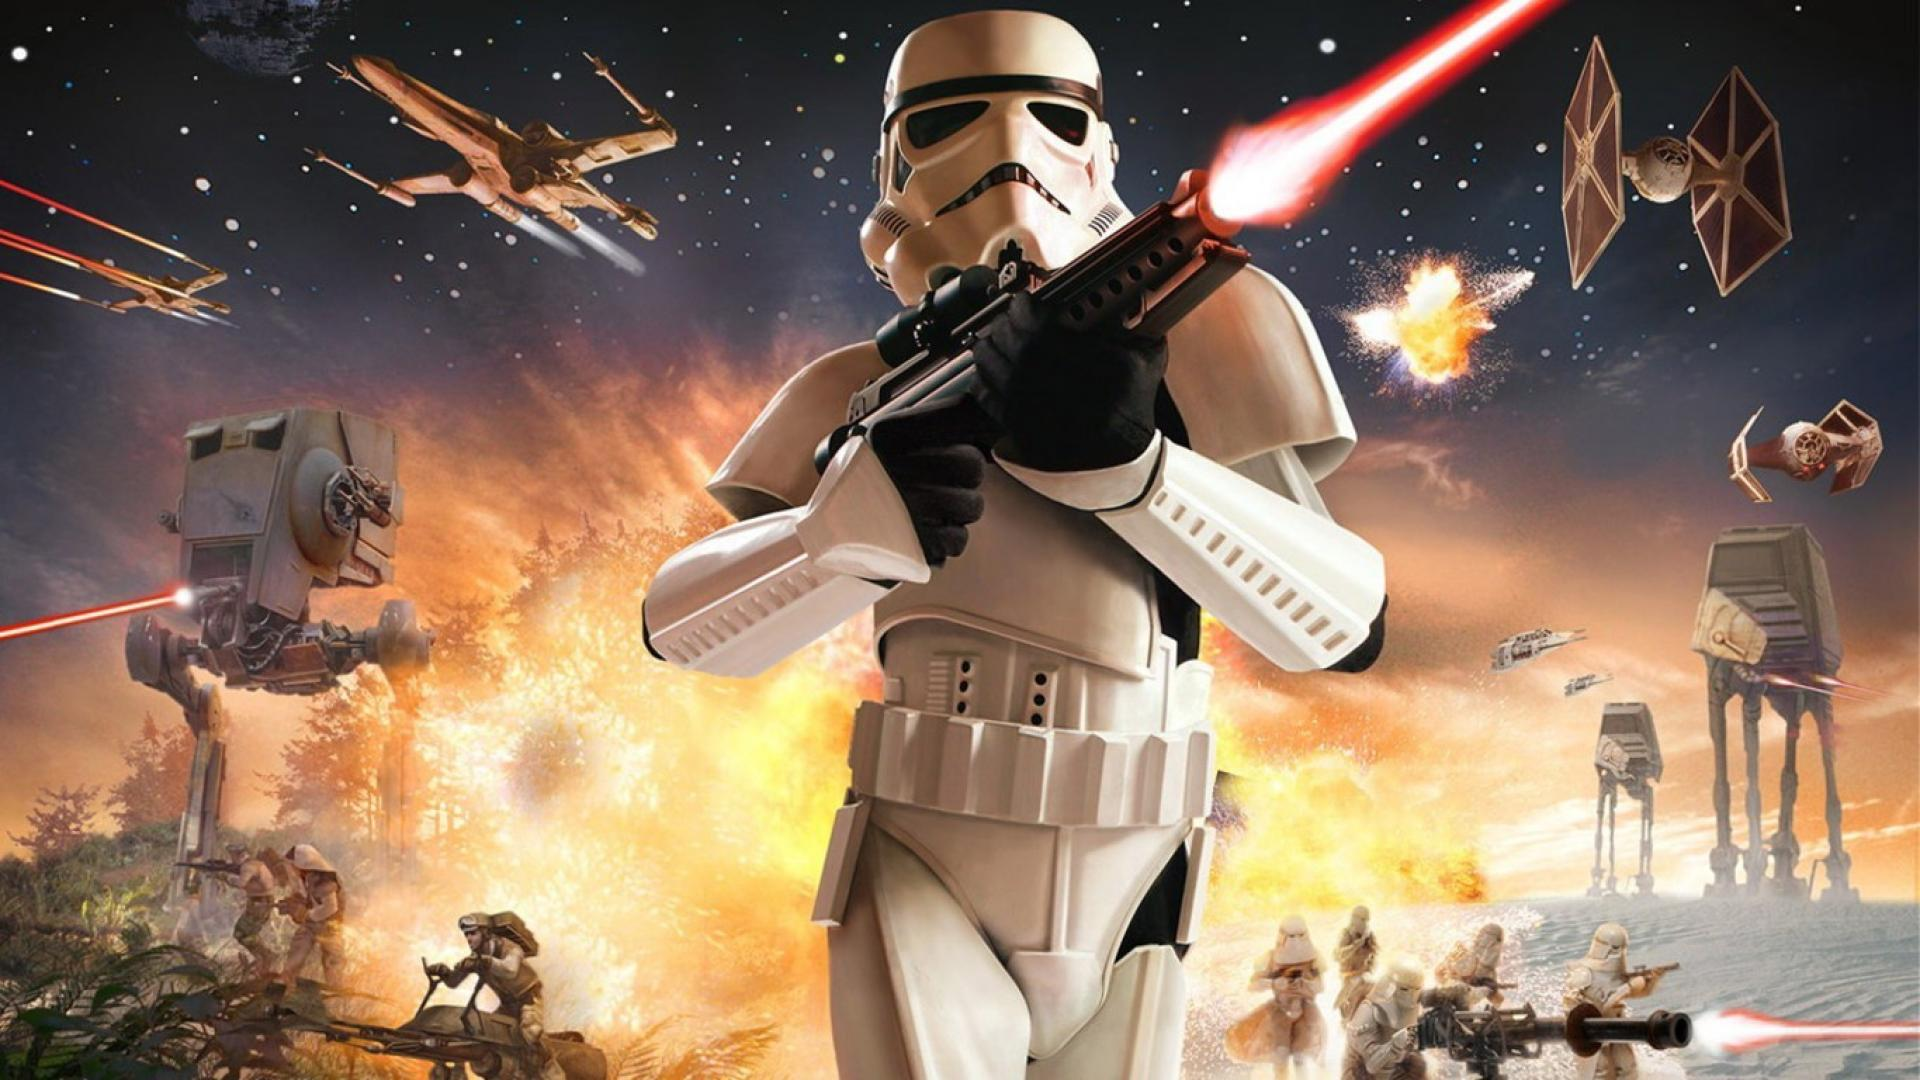 Free Download Star Wars Battlefront Galactic Empire Storm Trooper